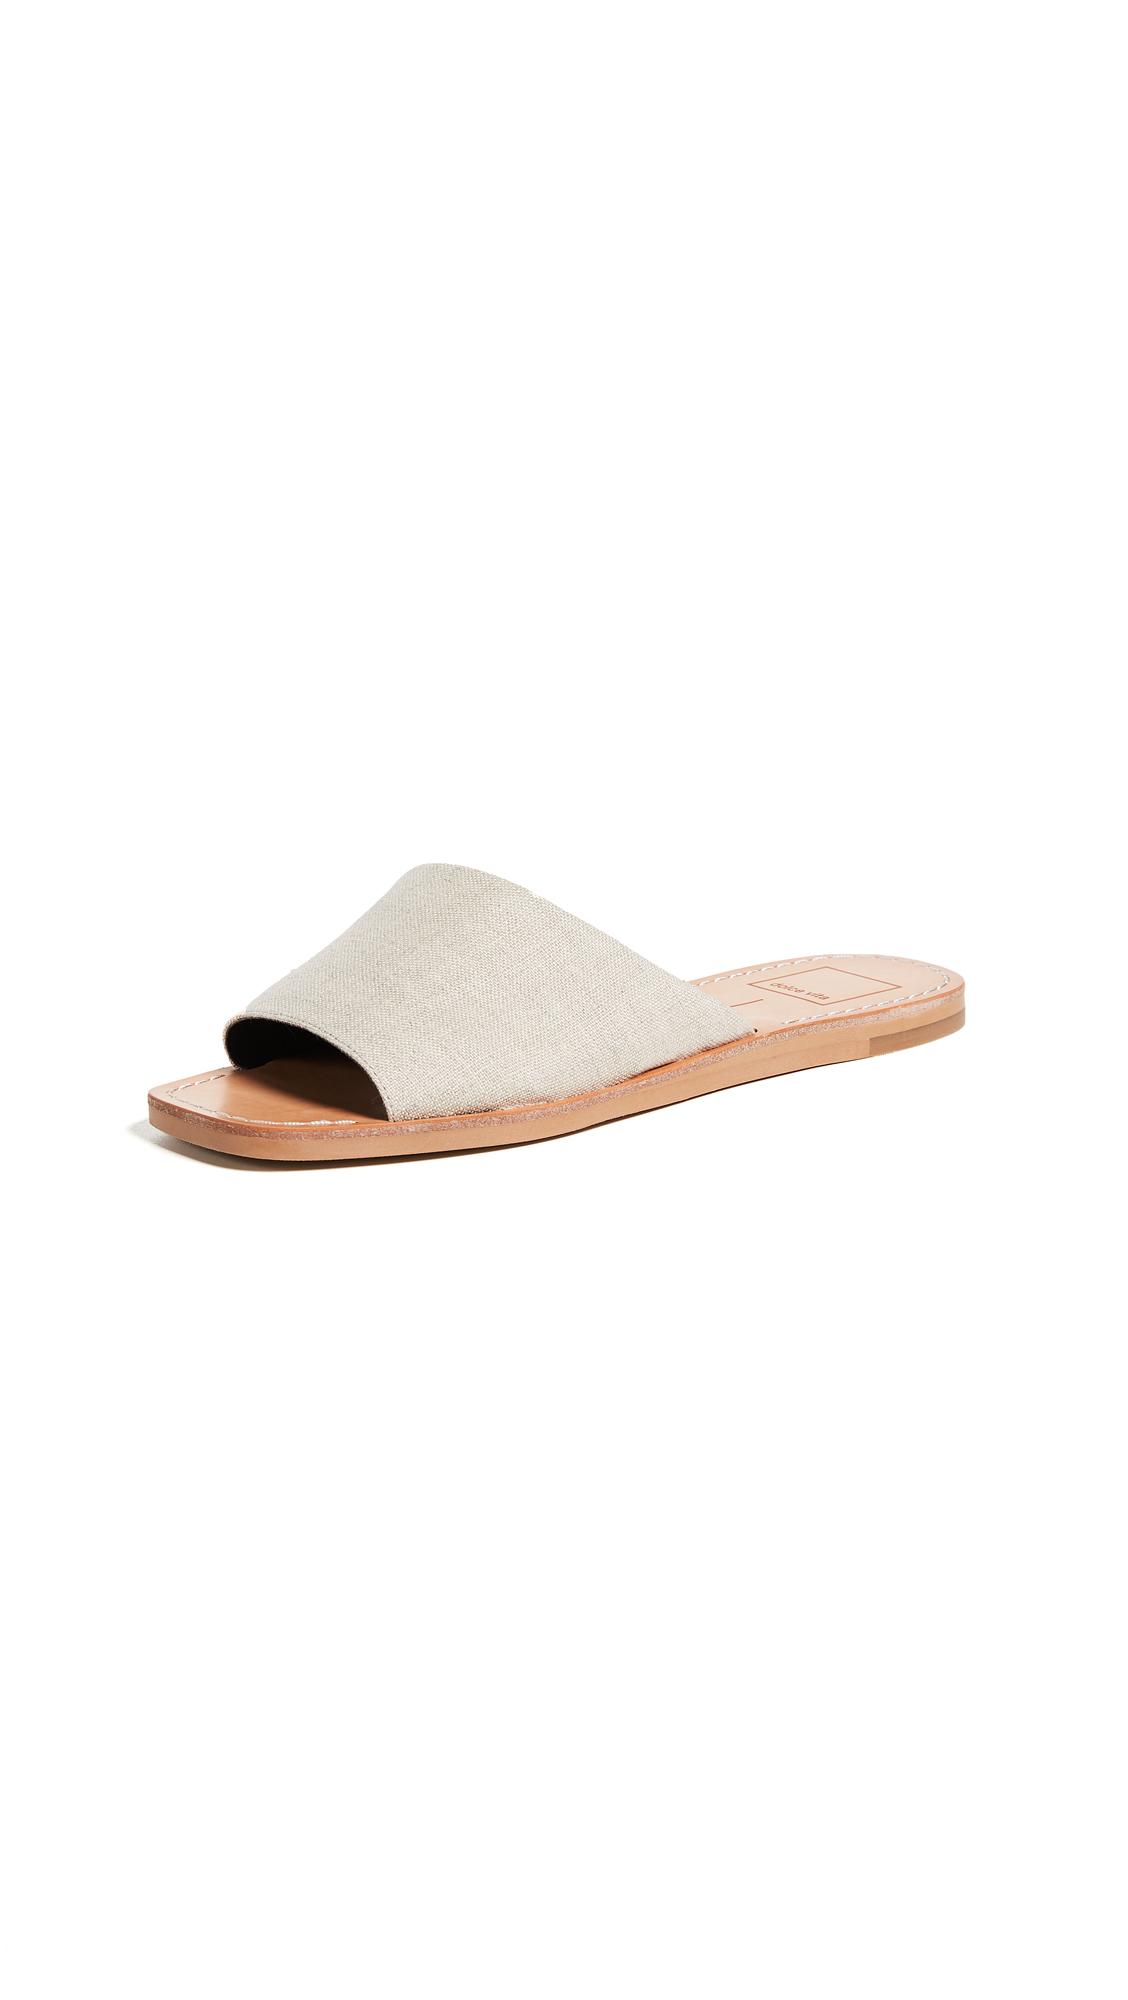 Dolce Vita Cato Slides In Sand